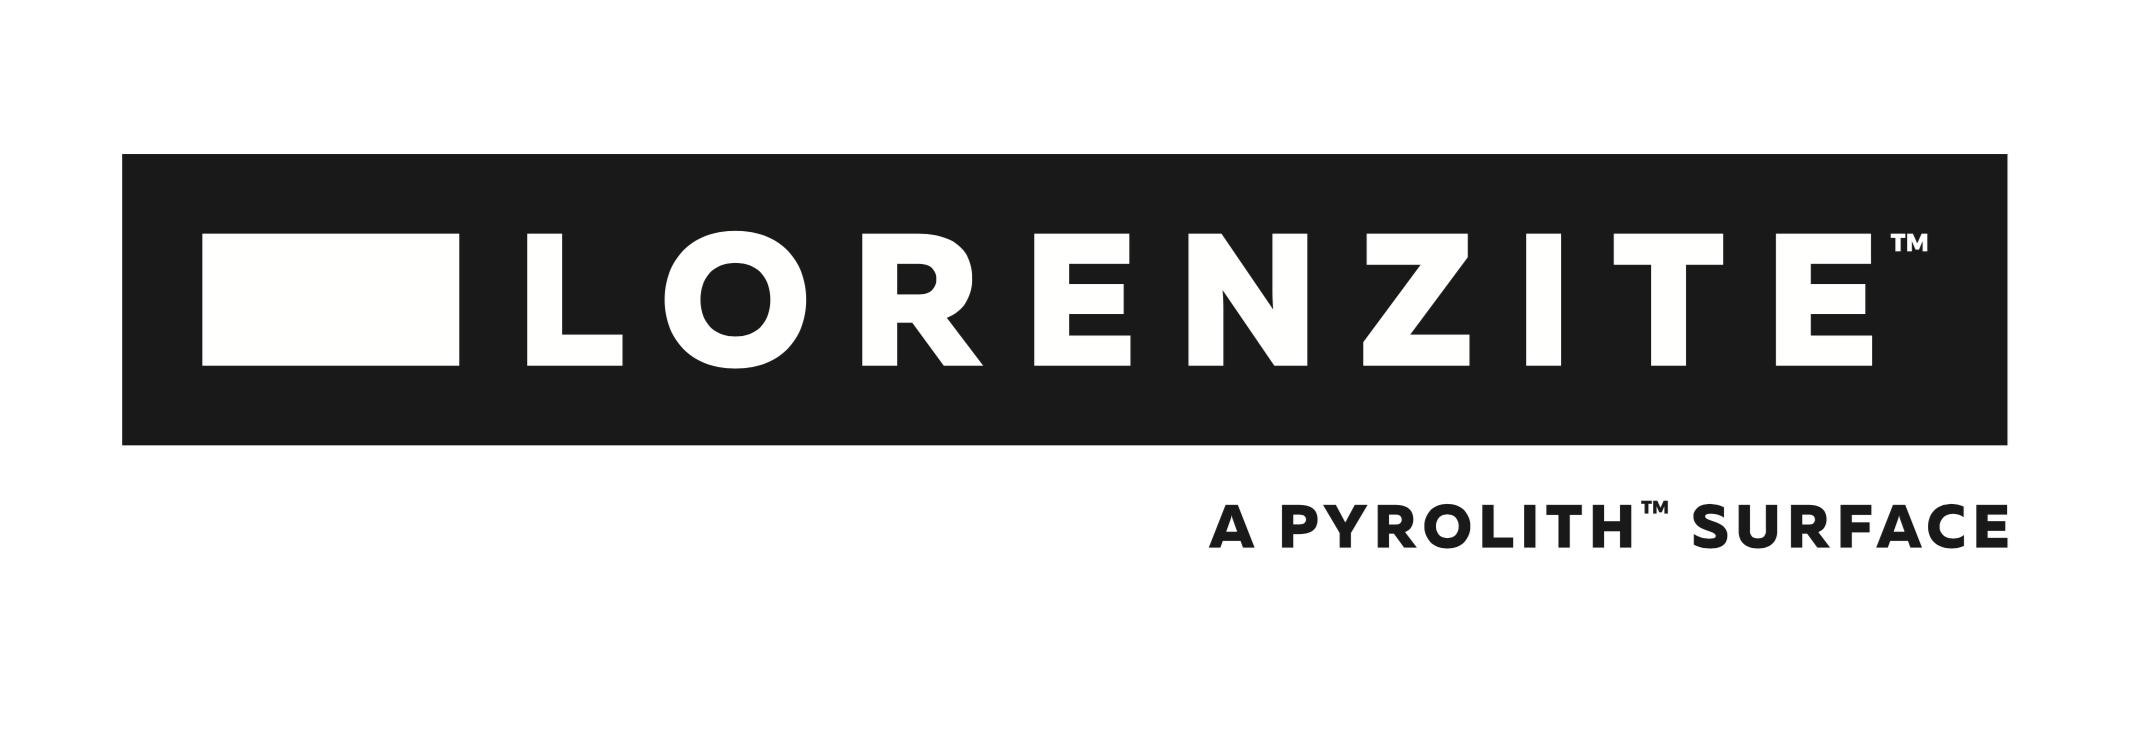 LORENZITE.png